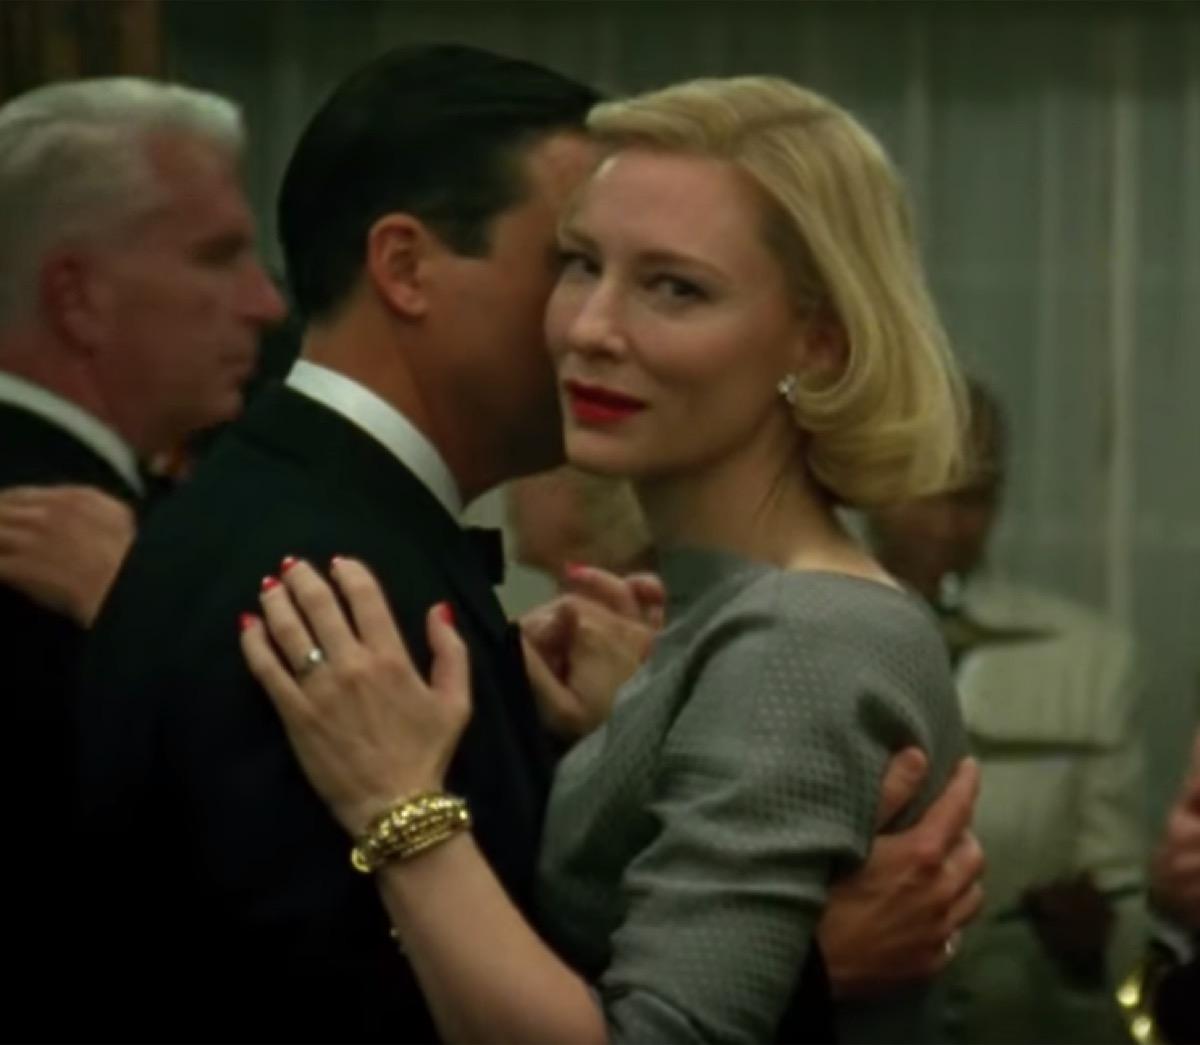 carol dancing with husband, best romance movies on netflix